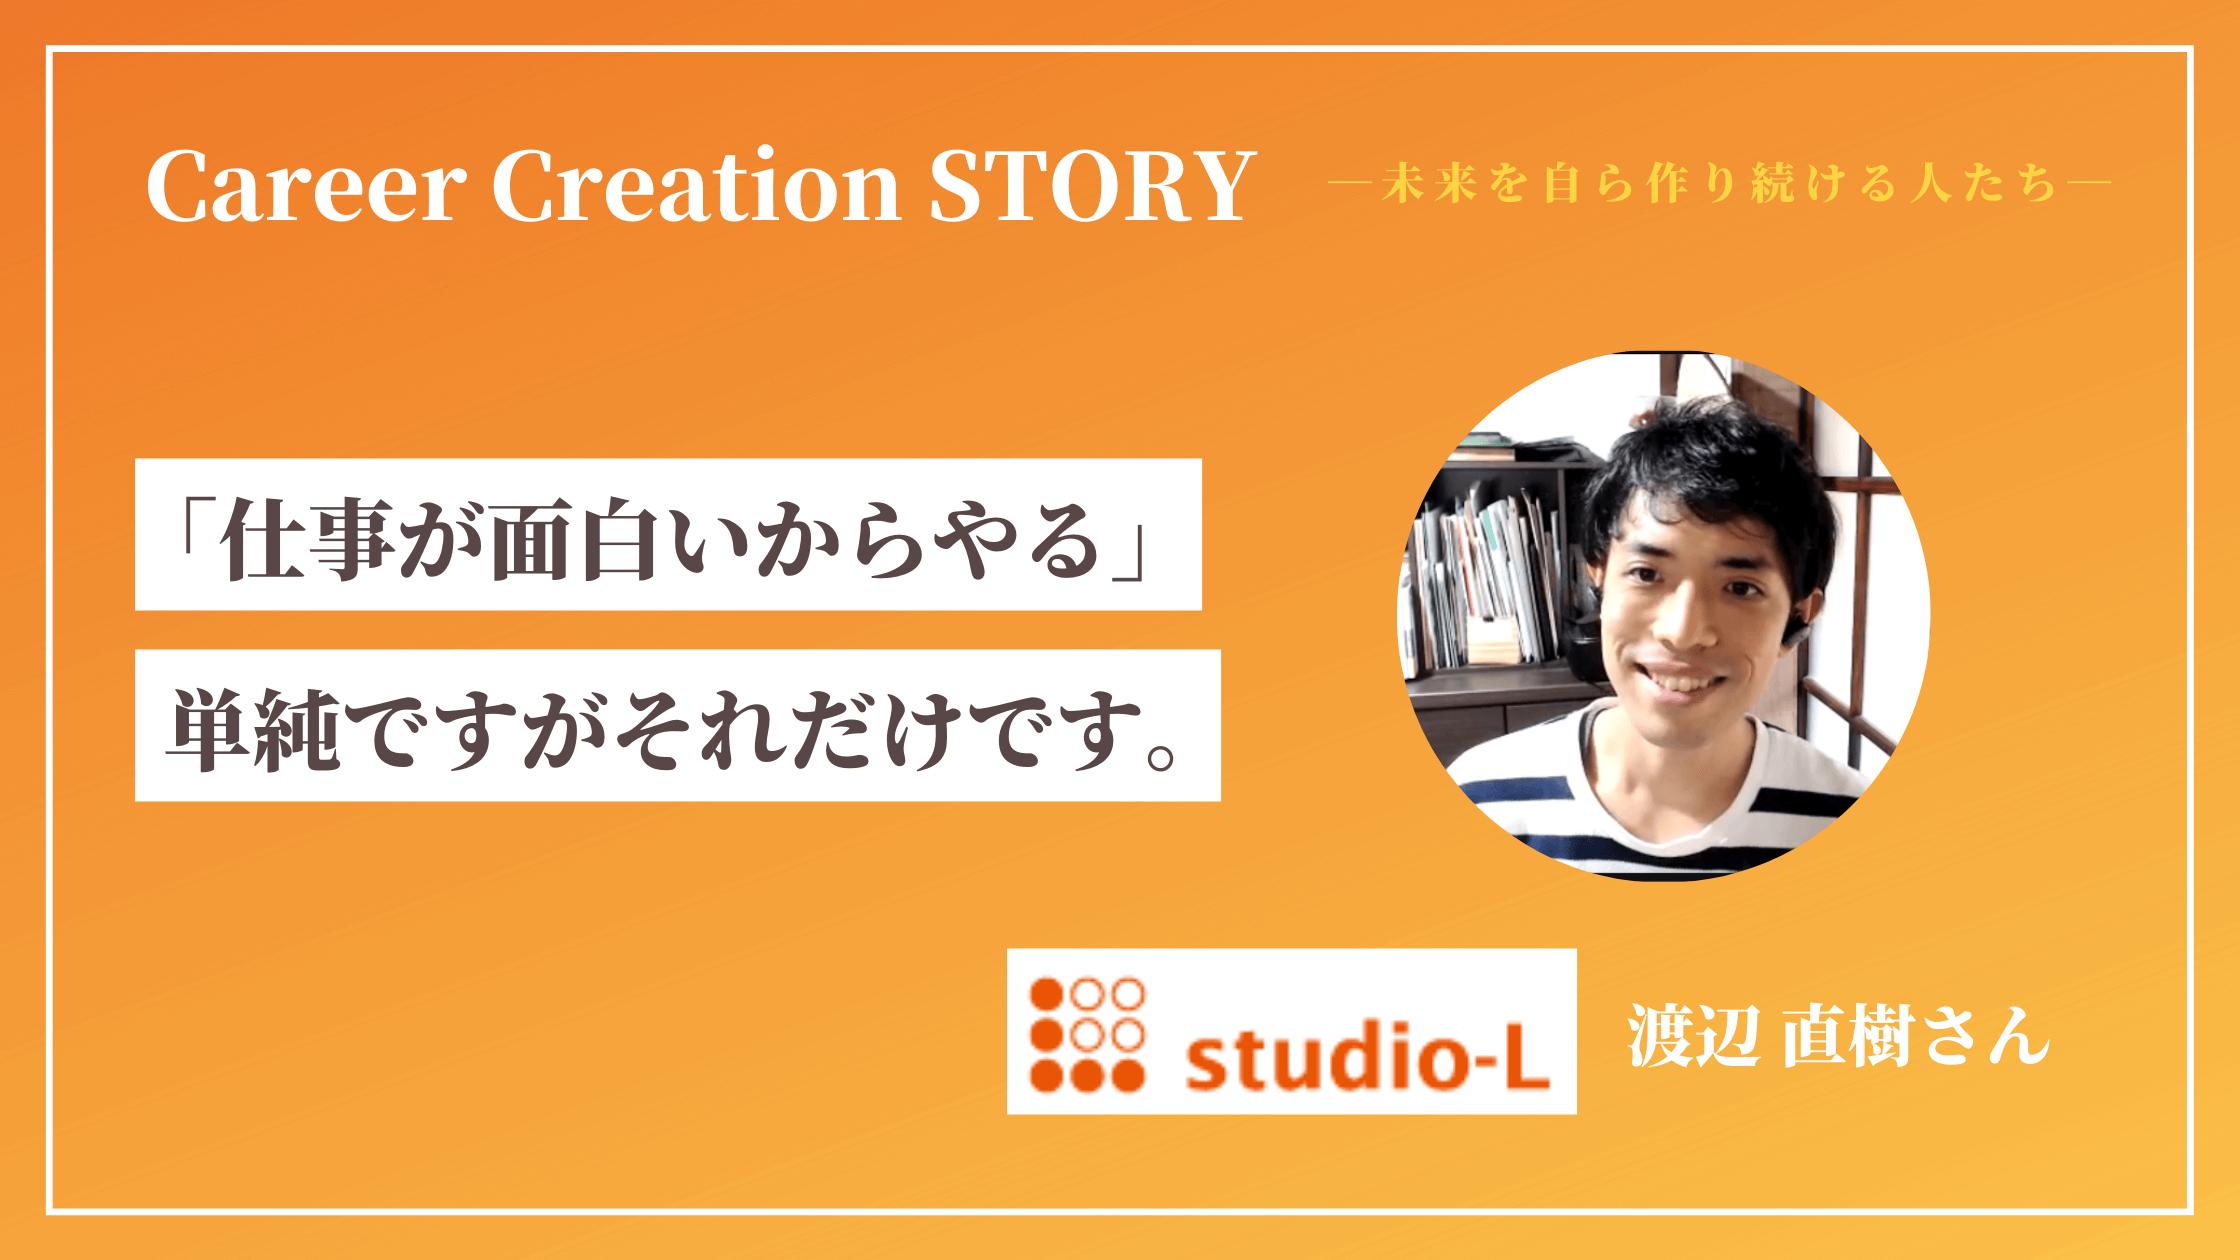 Career Creation STORY #10:studio-L 渡辺直樹さん